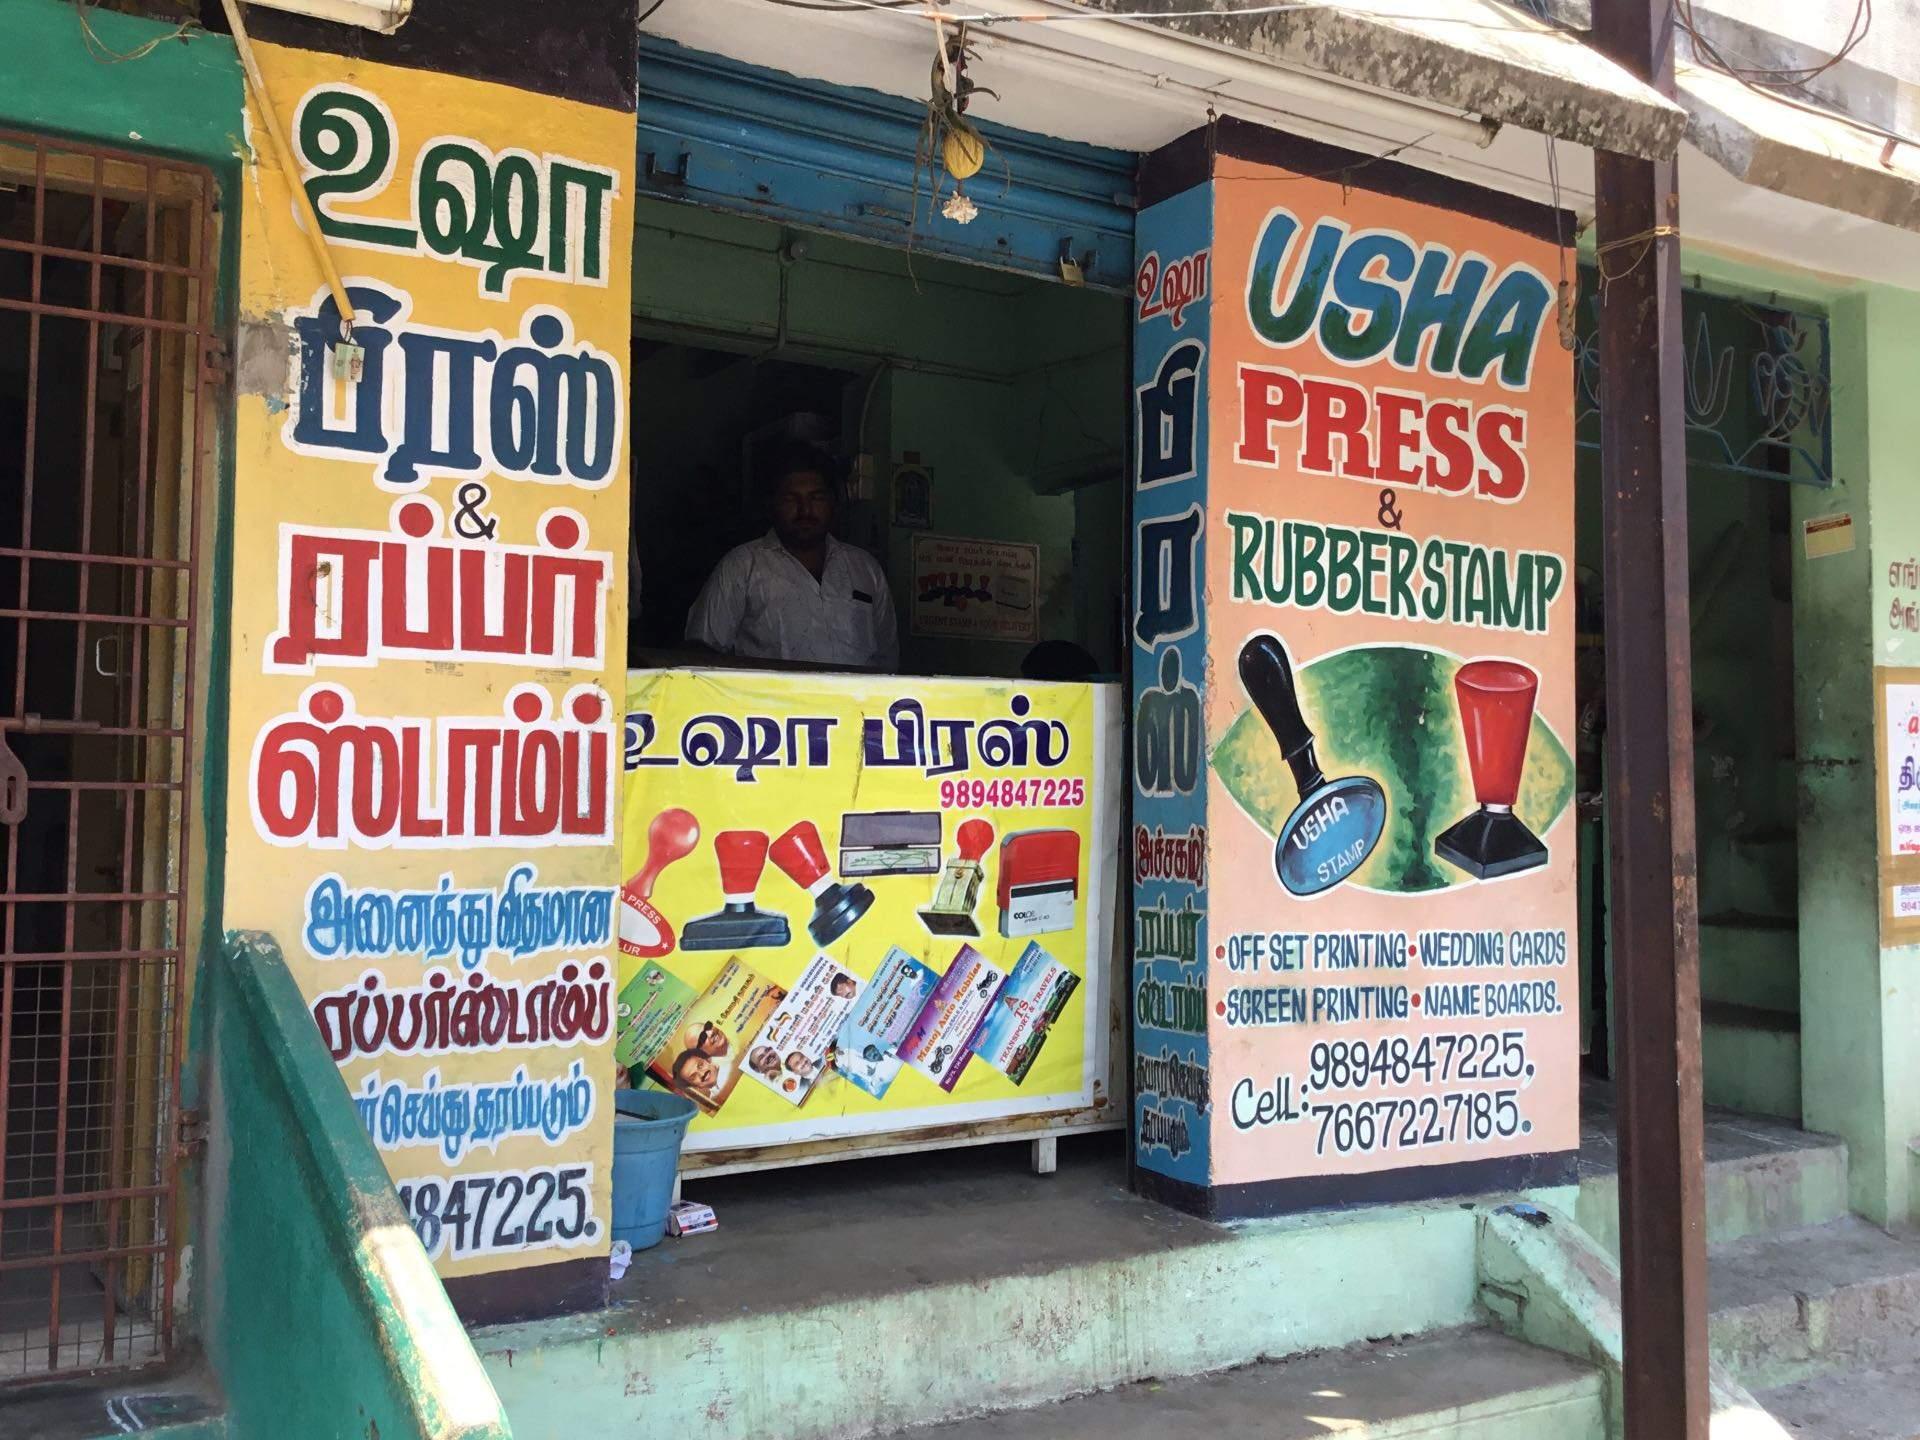 Top Rubber Stamp Manufacturers in Tiruvallur - Best Stamp